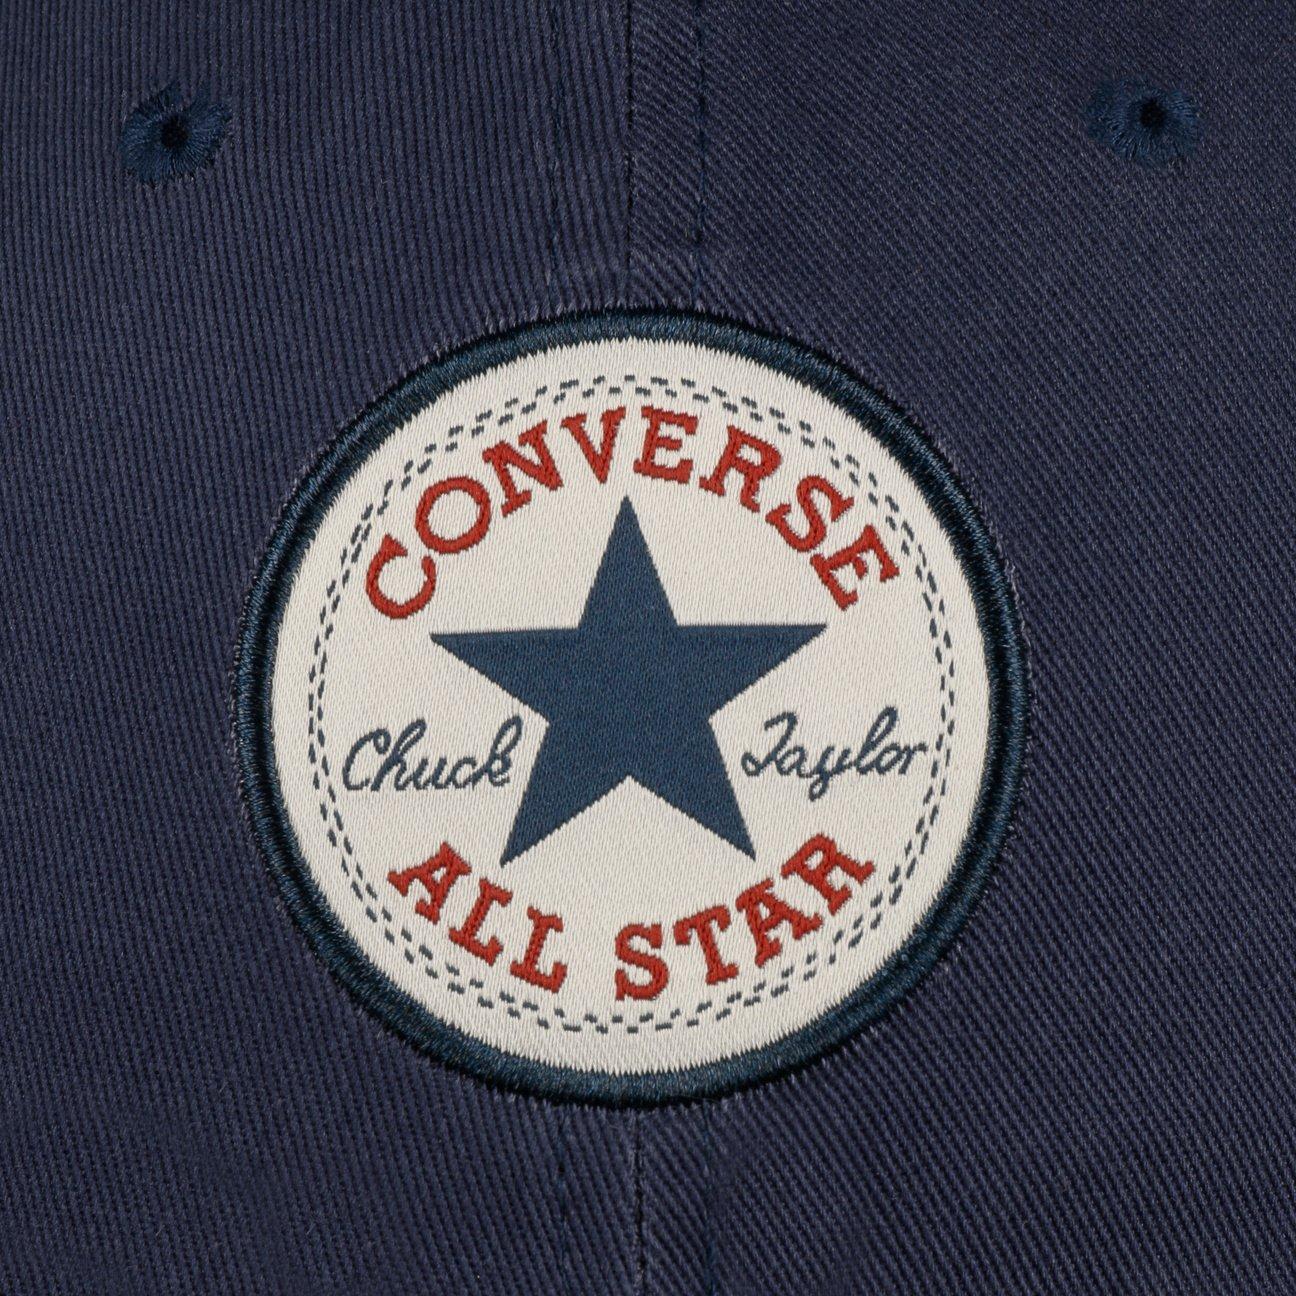 5492ec80ba4 ... Core Classic Baseball Cap by Converse - blue 5 ...